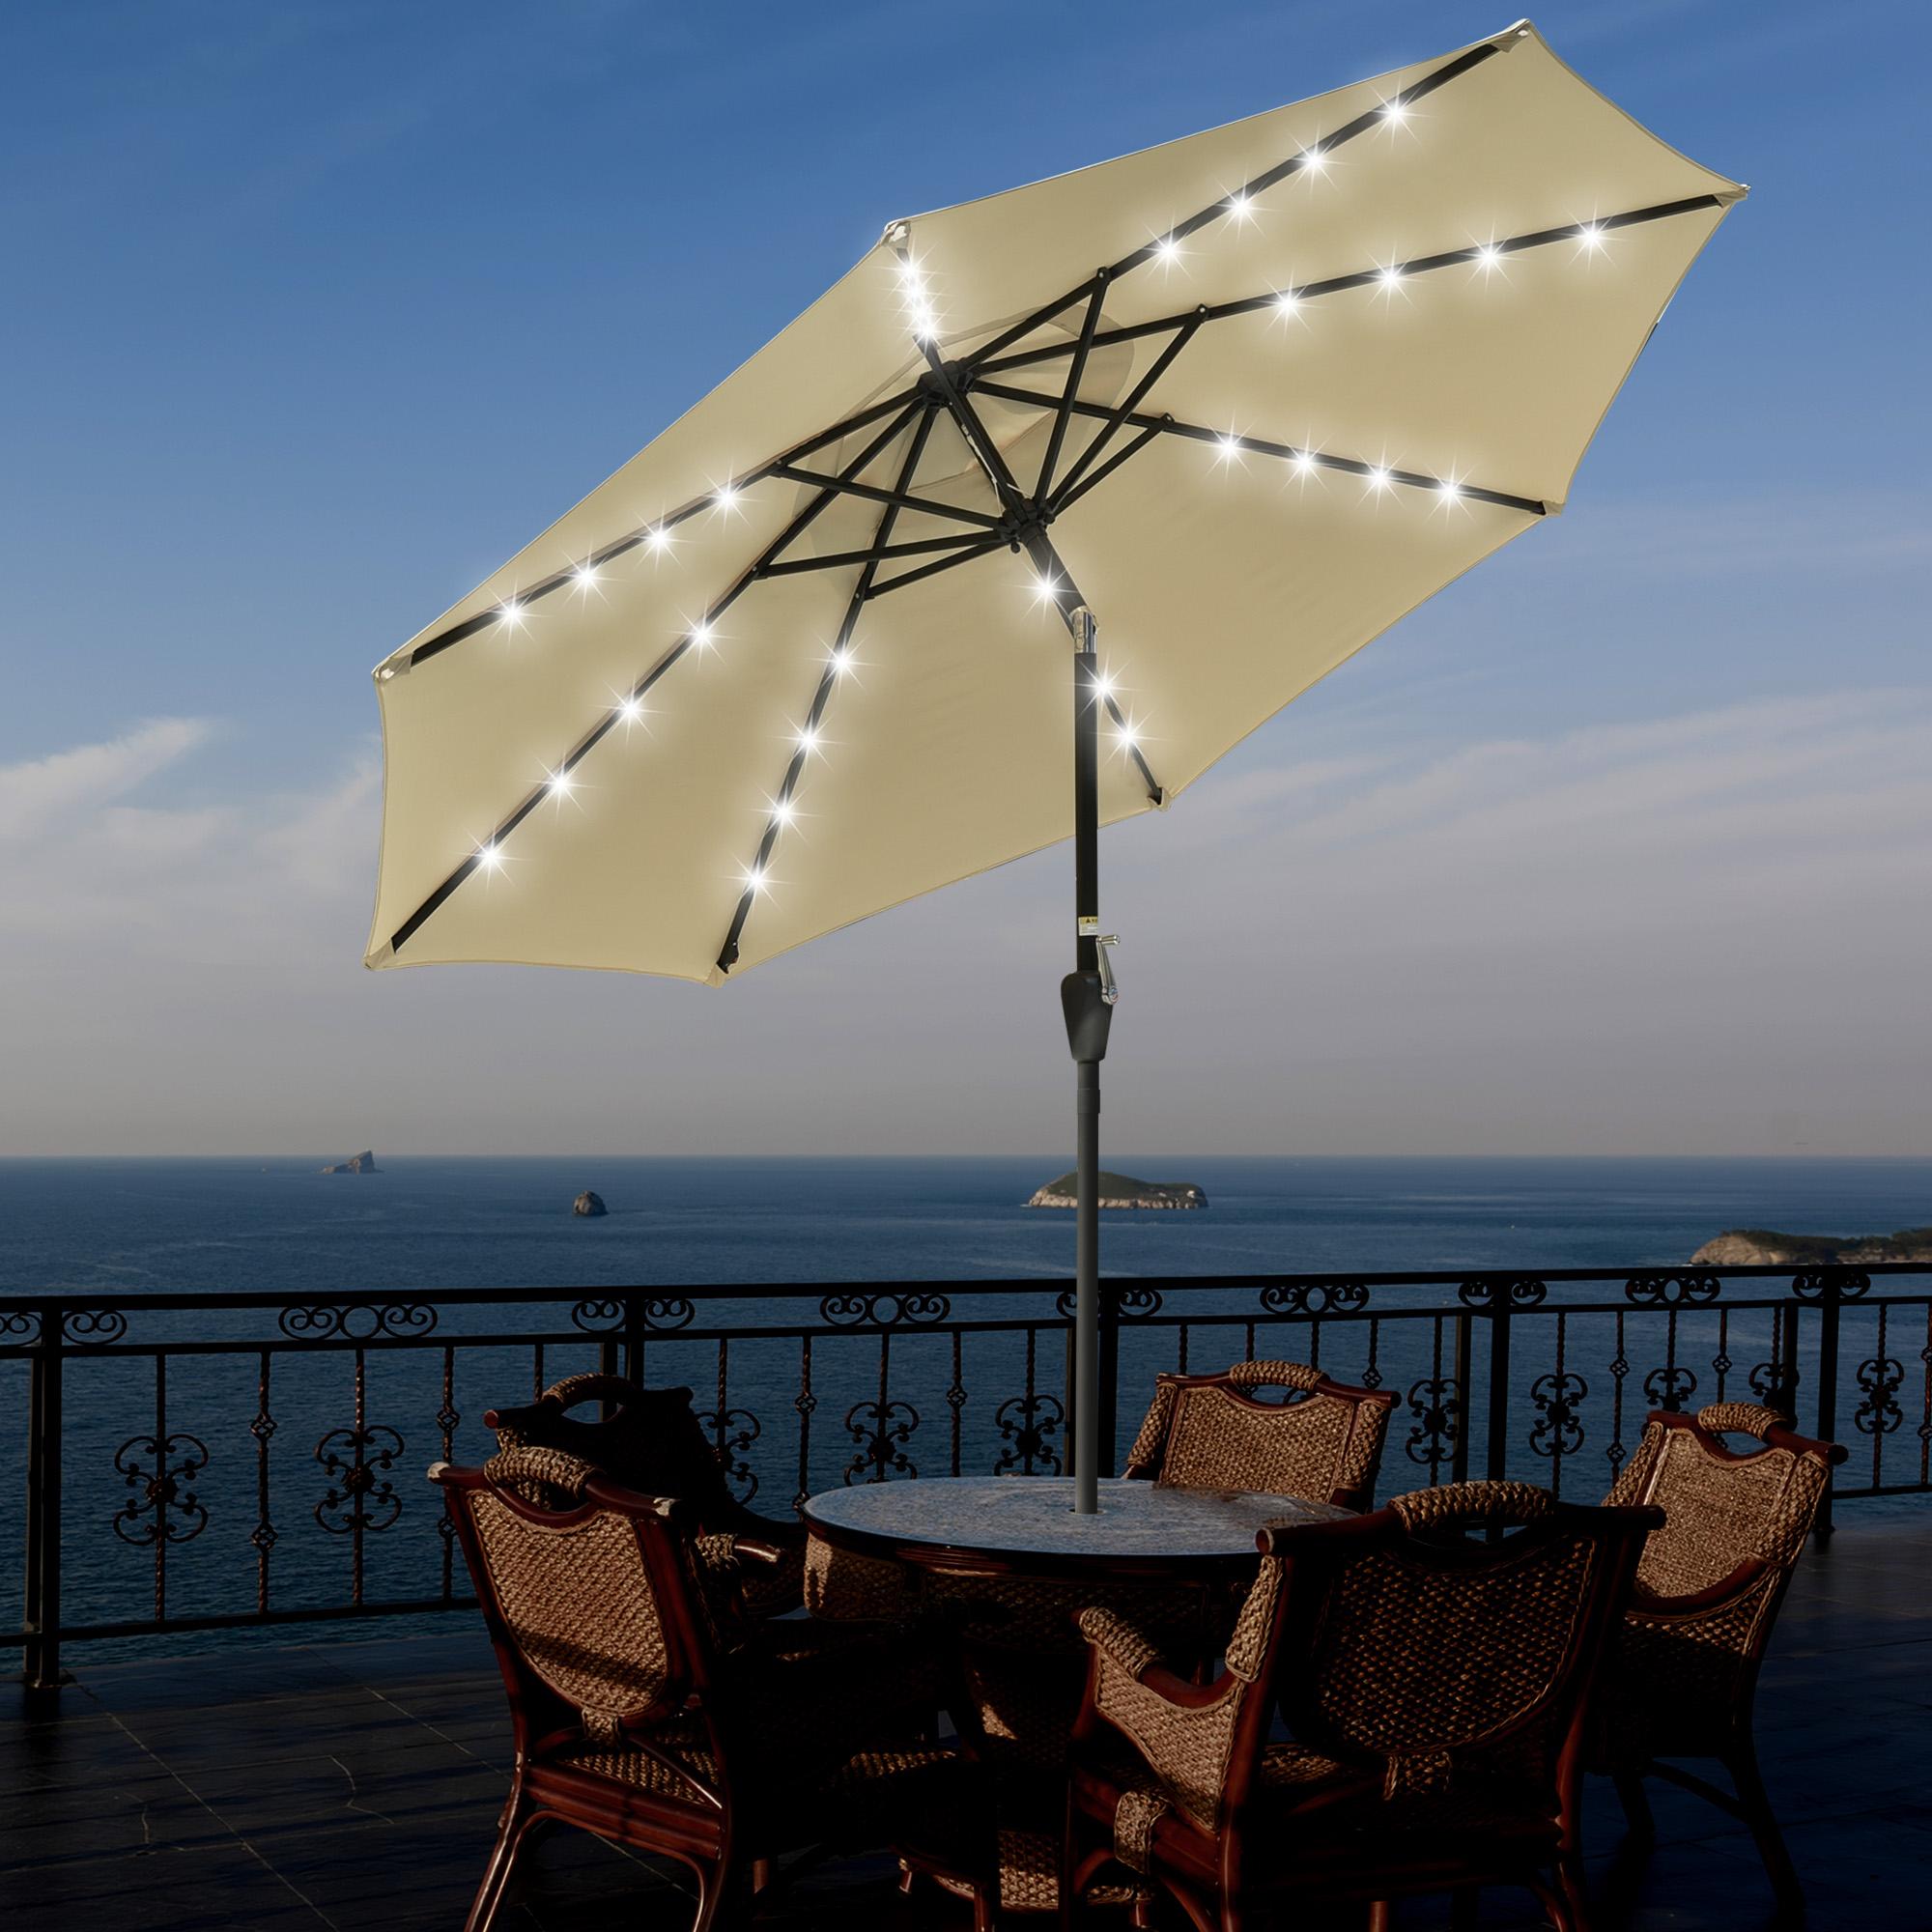 thumbnail 29 - 9' Patio Outdoor Umbrella Solar LED 8 Rib Garden Parasol Yard Deck Table Shade